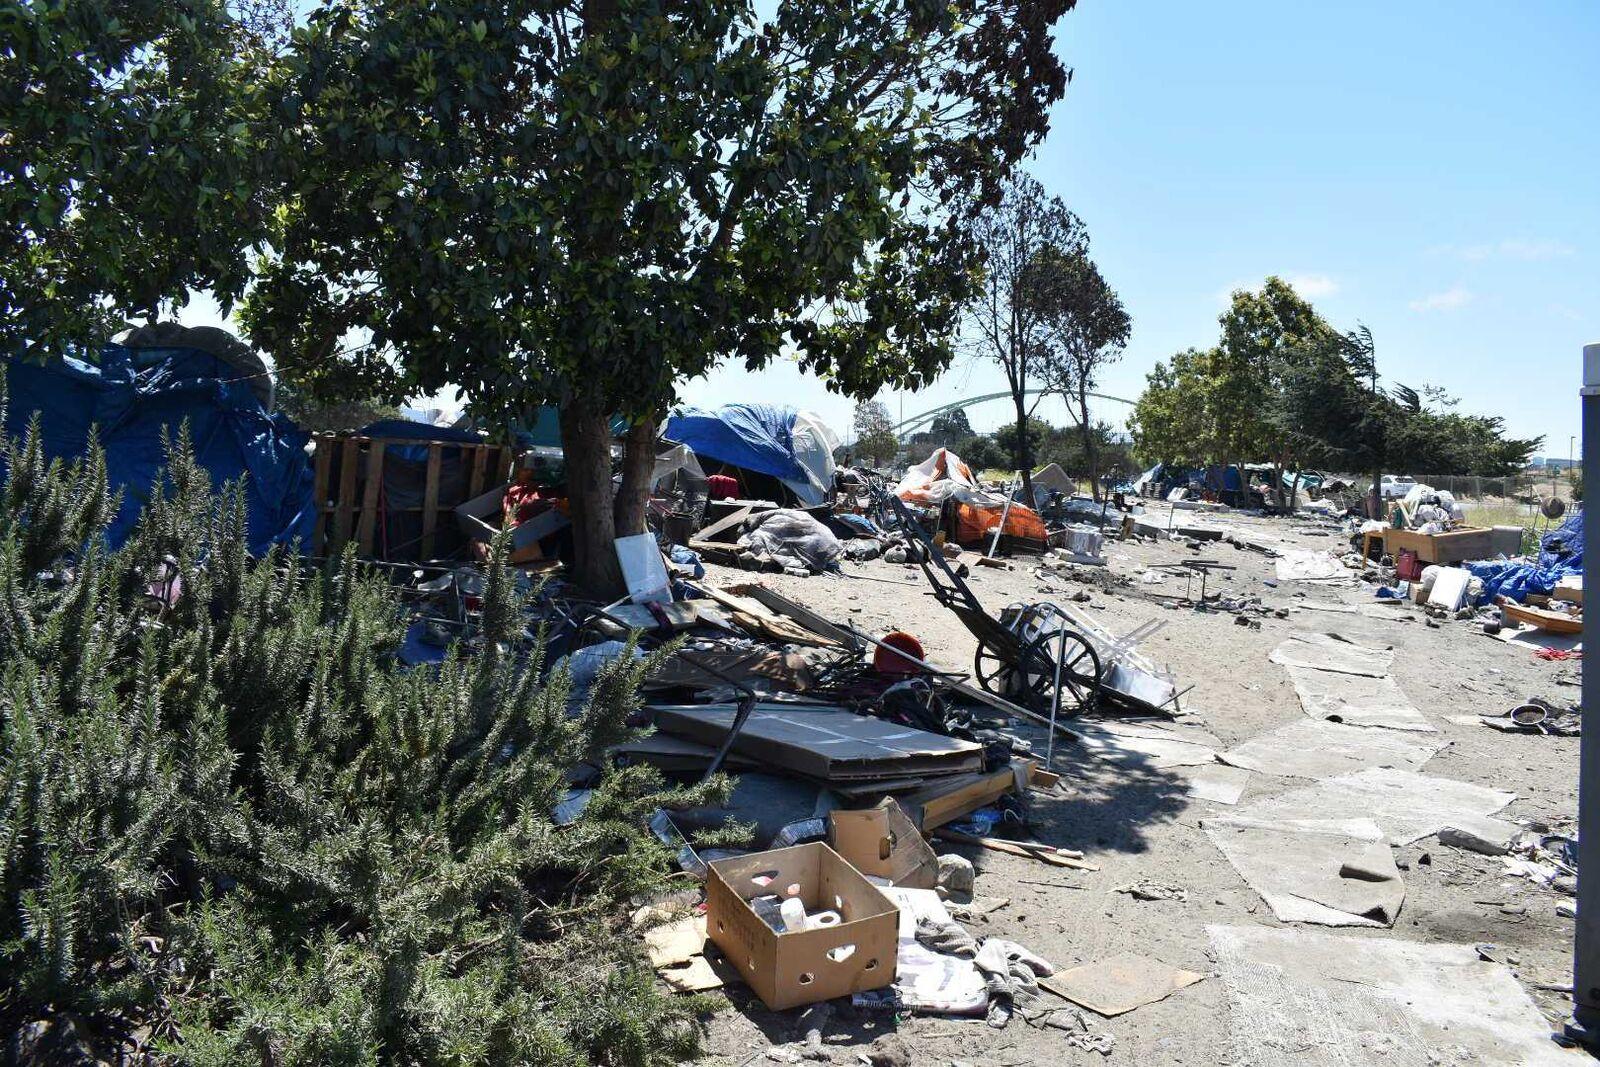 Frontage University Encampment